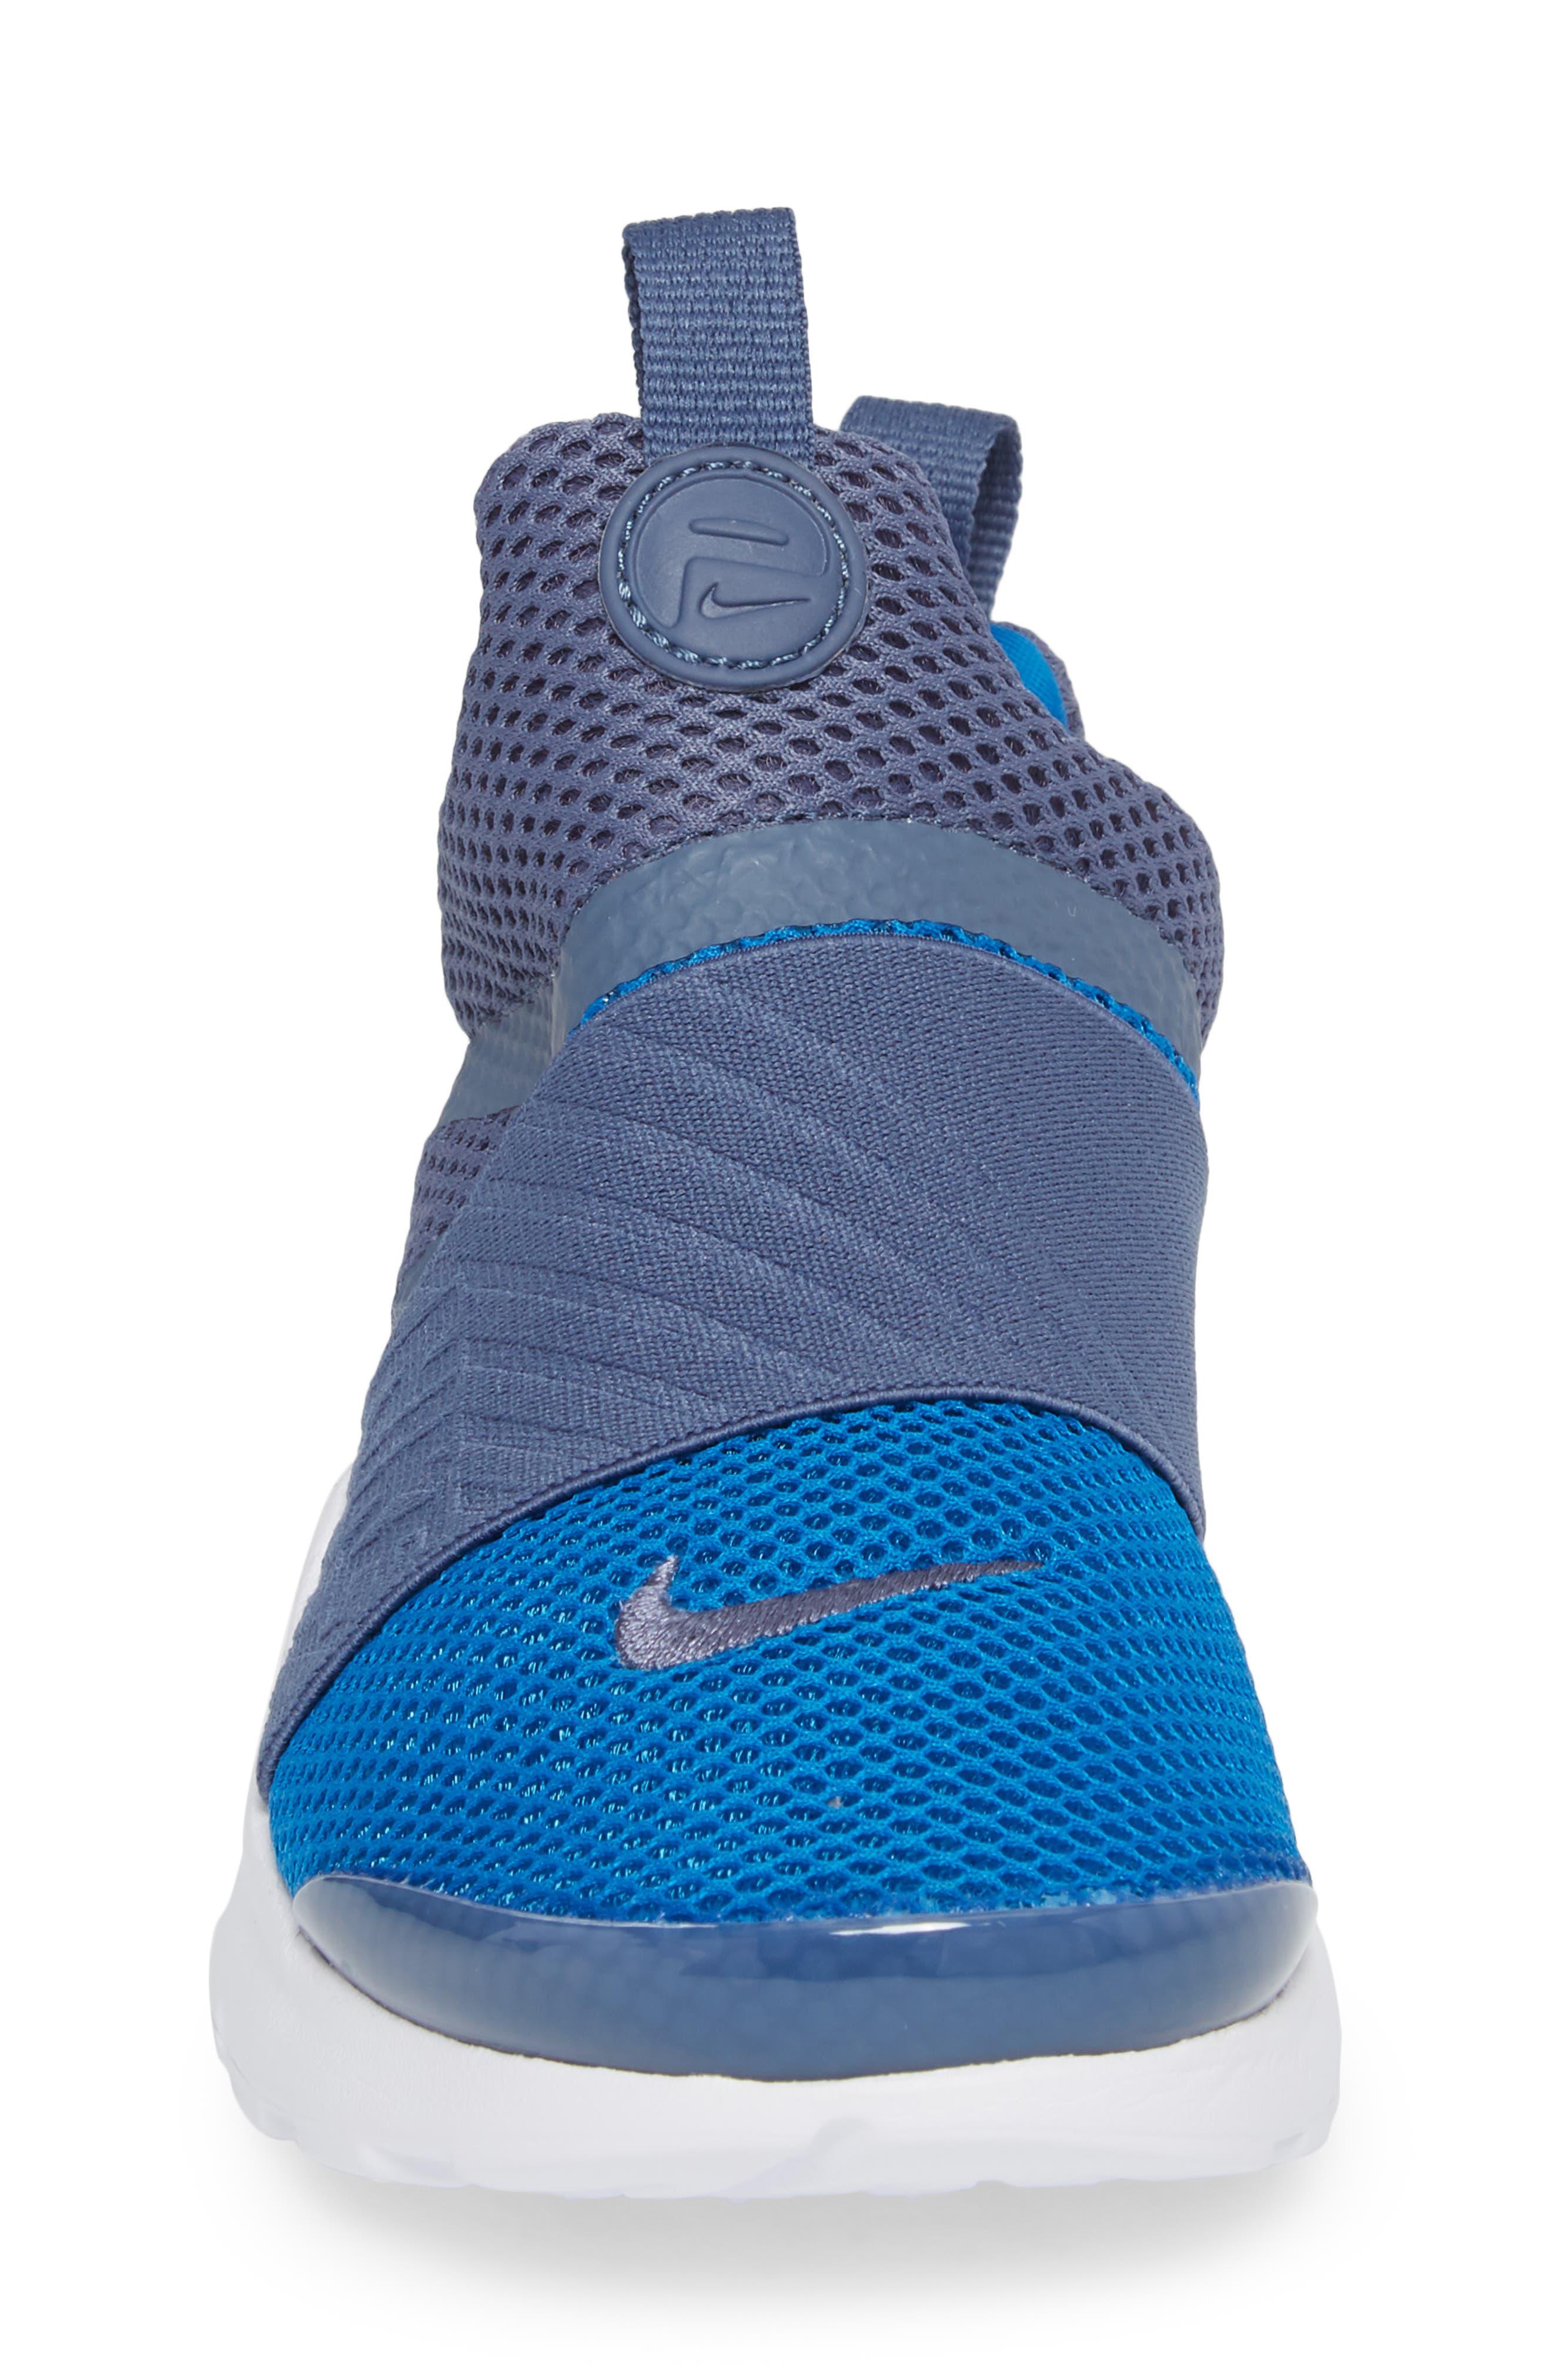 Presto Extreme Sneaker,                             Alternate thumbnail 38, color,